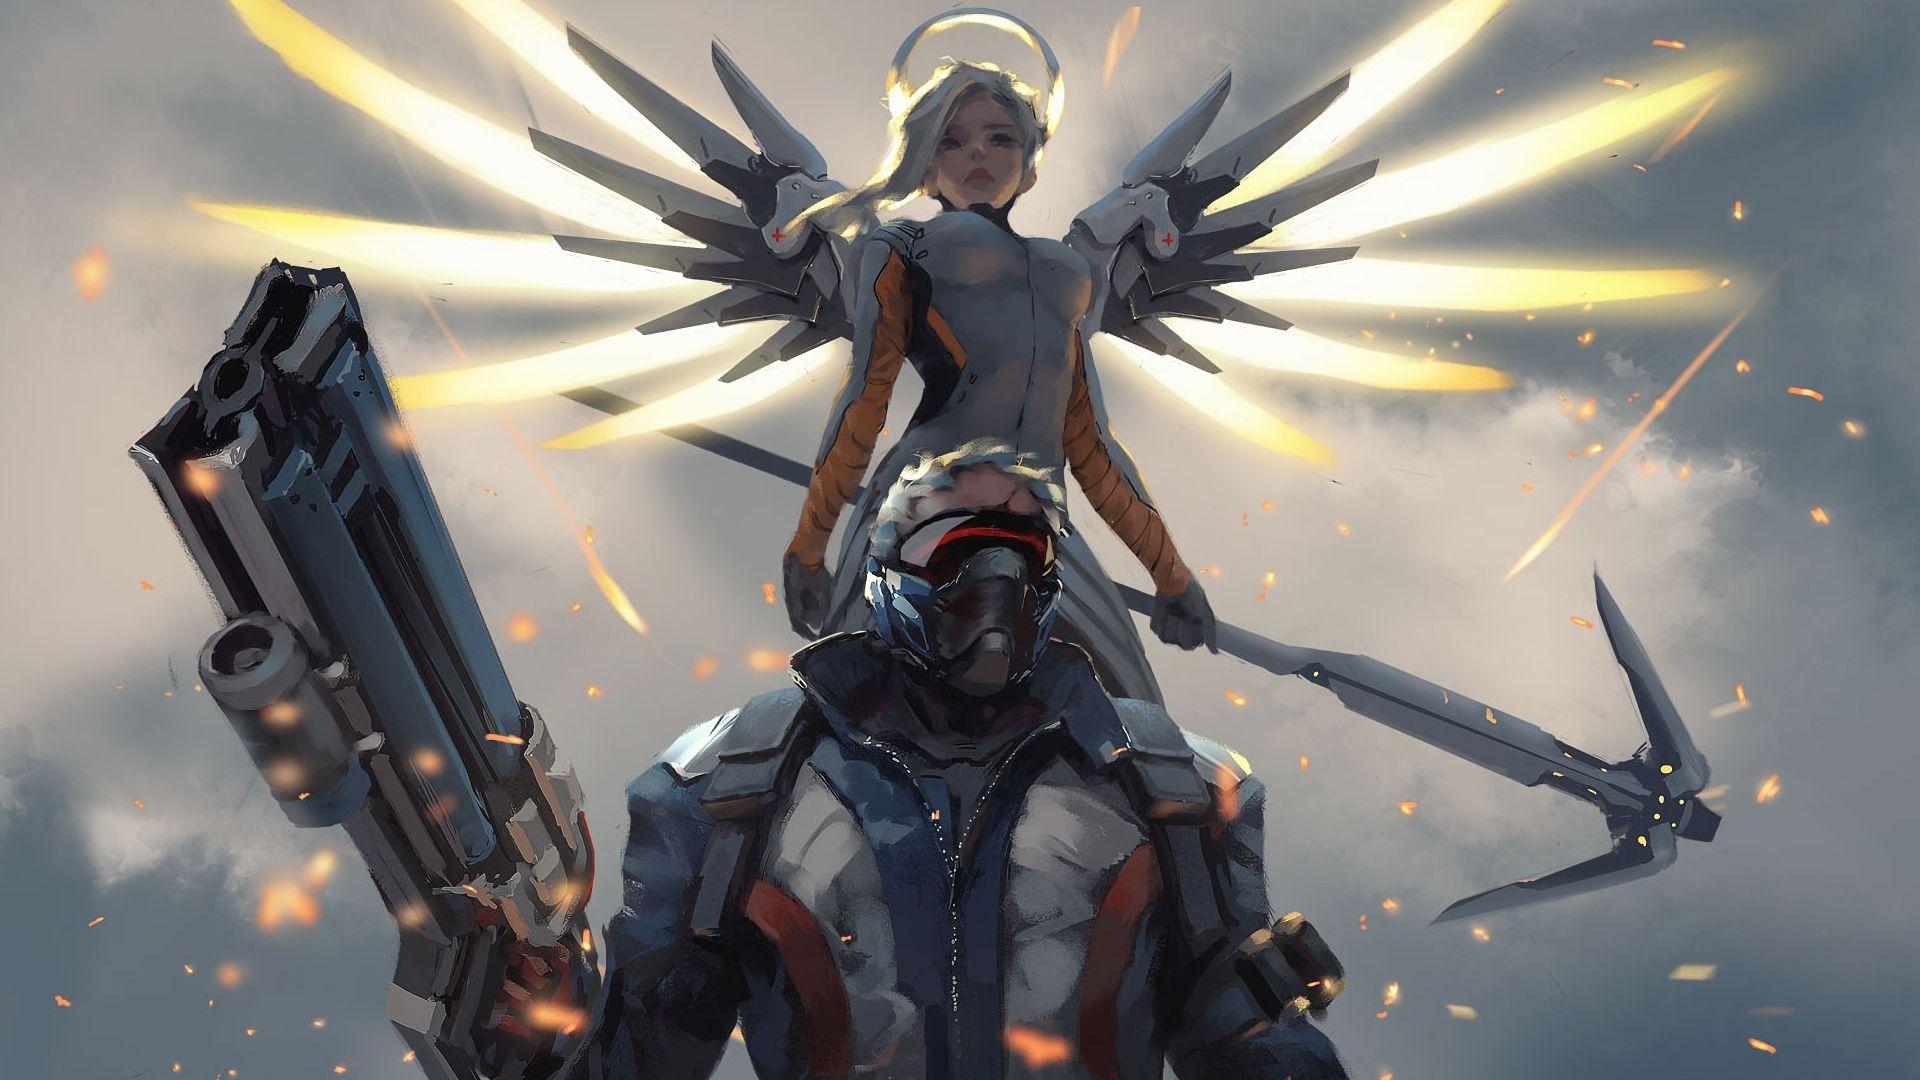 Mercy And Soldier 76 Overwatch 1920x1080 Wallpaper Overwatch Personajes Soldado 76 Overwatch